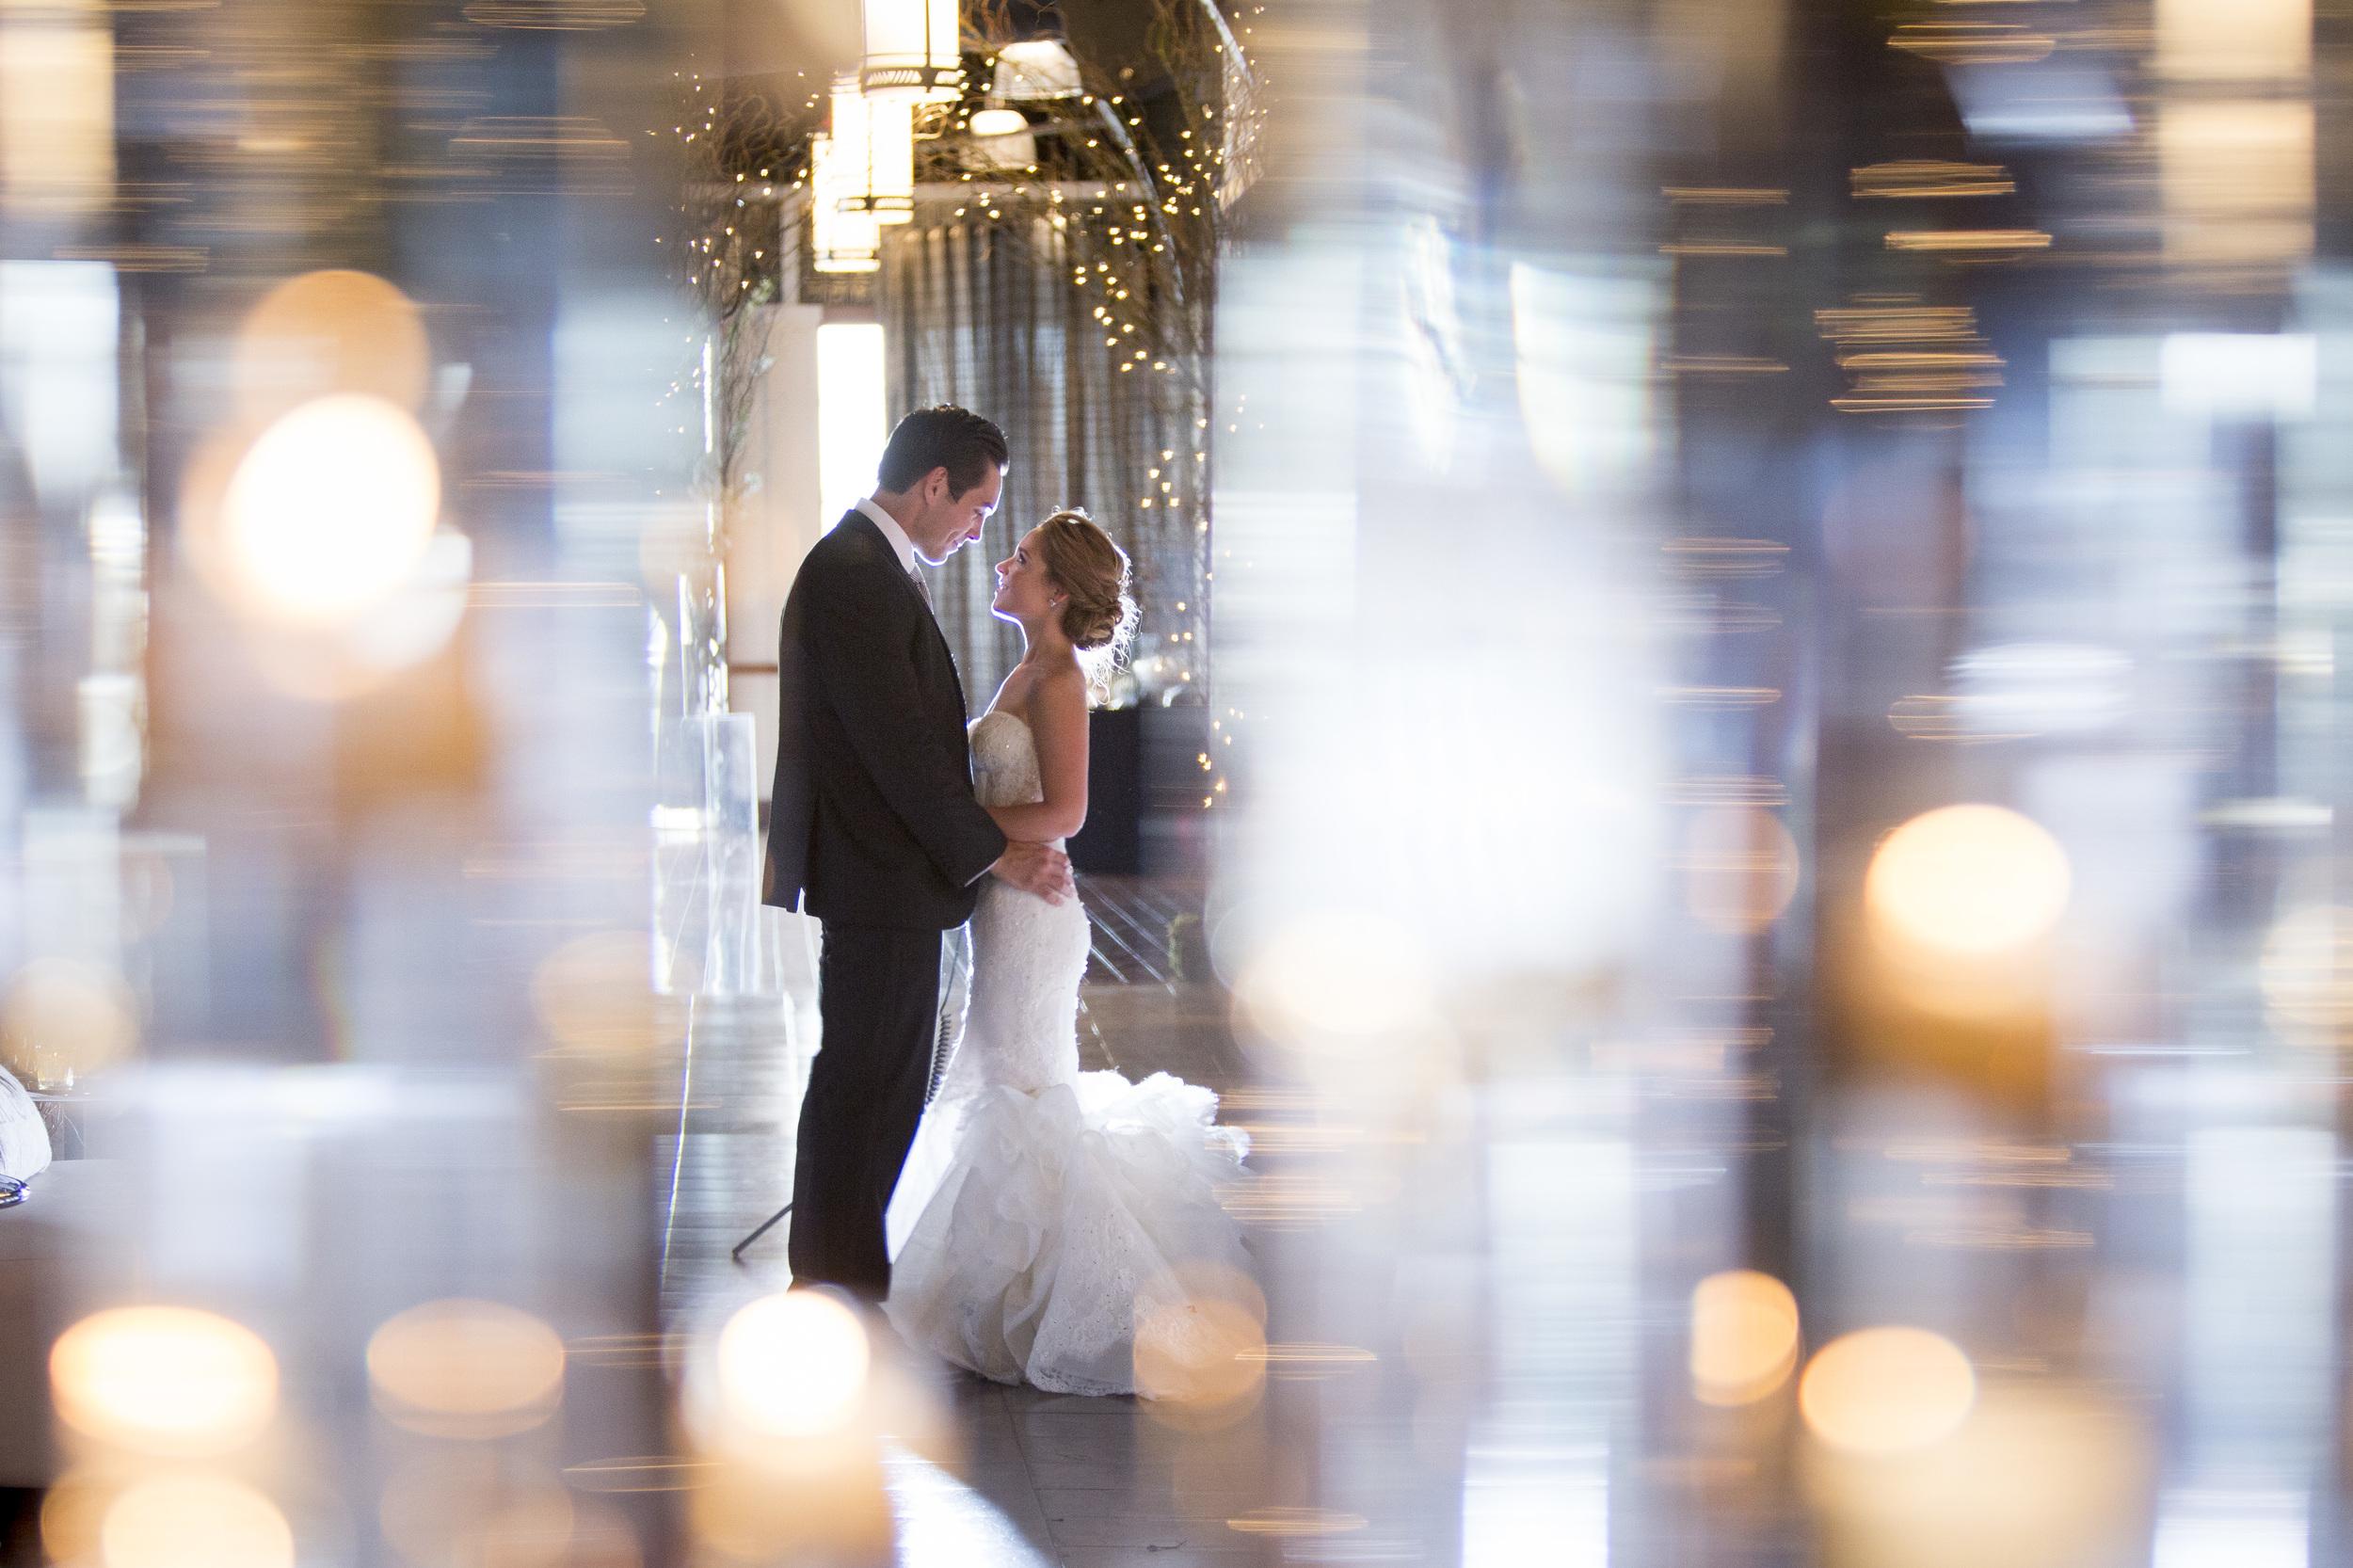 Ceci_New_York_Style_Luxury_Custom_Summer_Wedding_CeciBride_Letterpress_NewYork_Foil_Lighthouse_Chelsea_Piers_38.jpg